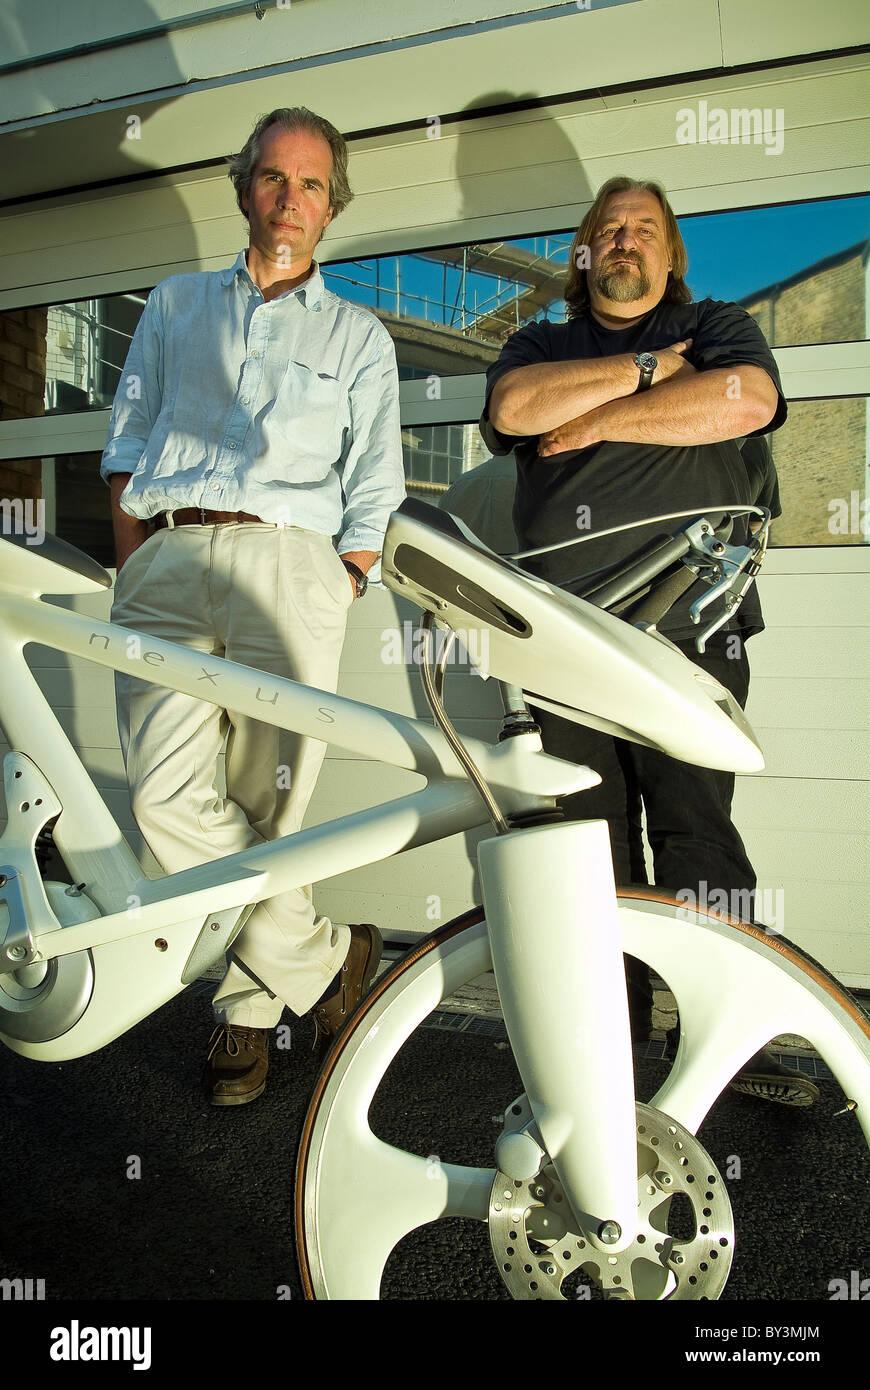 Dick Powell And Richard Seymour Of Seymour Powell Product Design Stock Photo Alamy